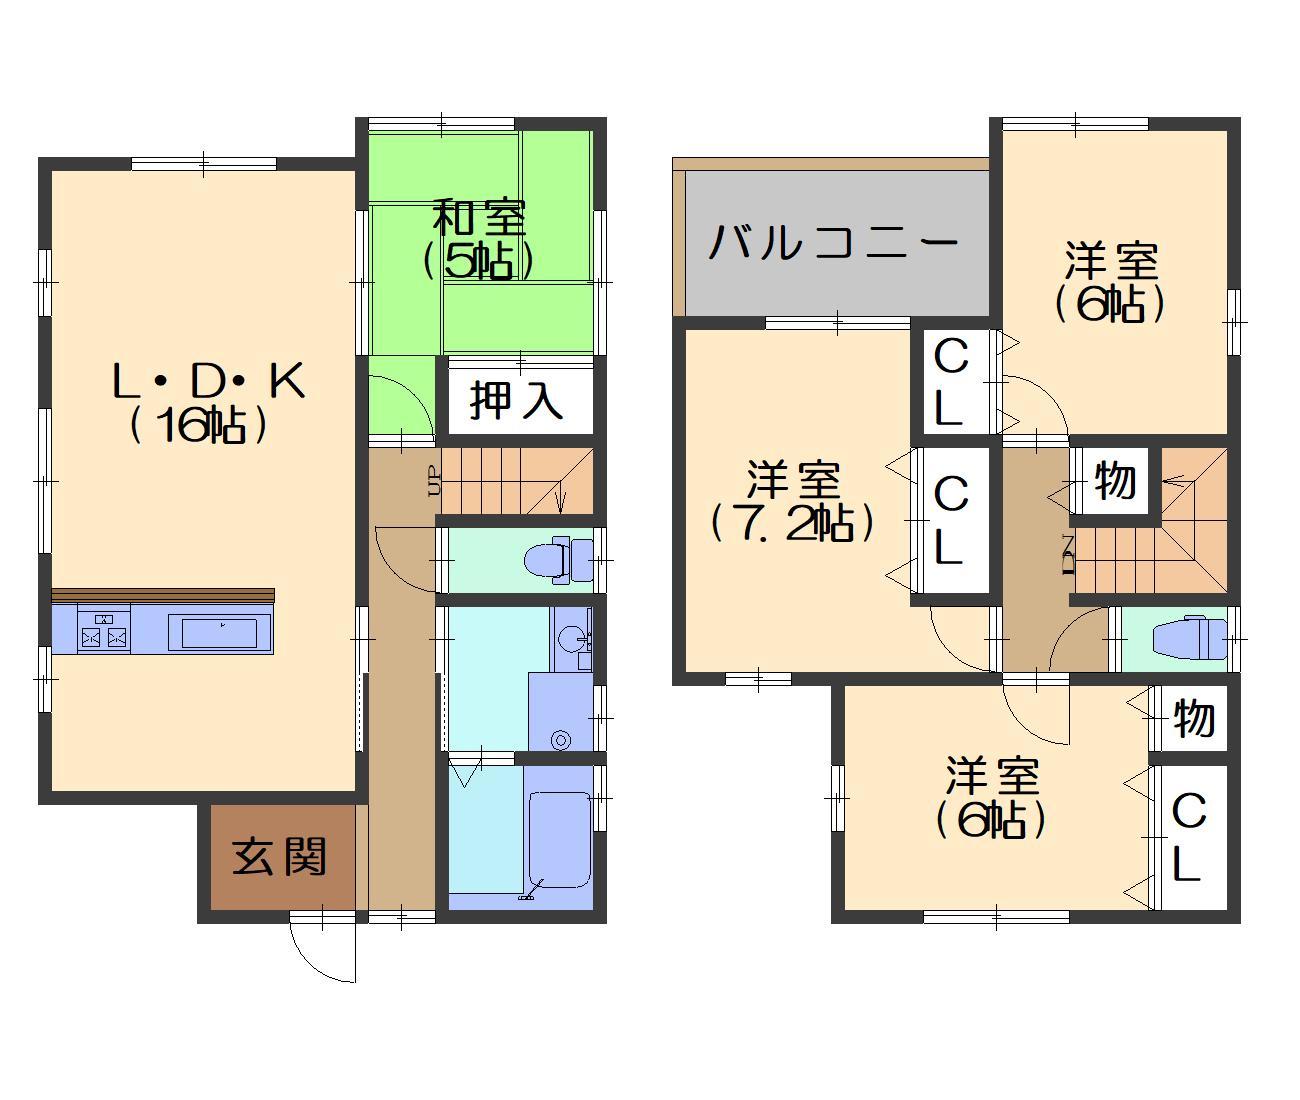 神足・新築 価格3198万円 イメージ